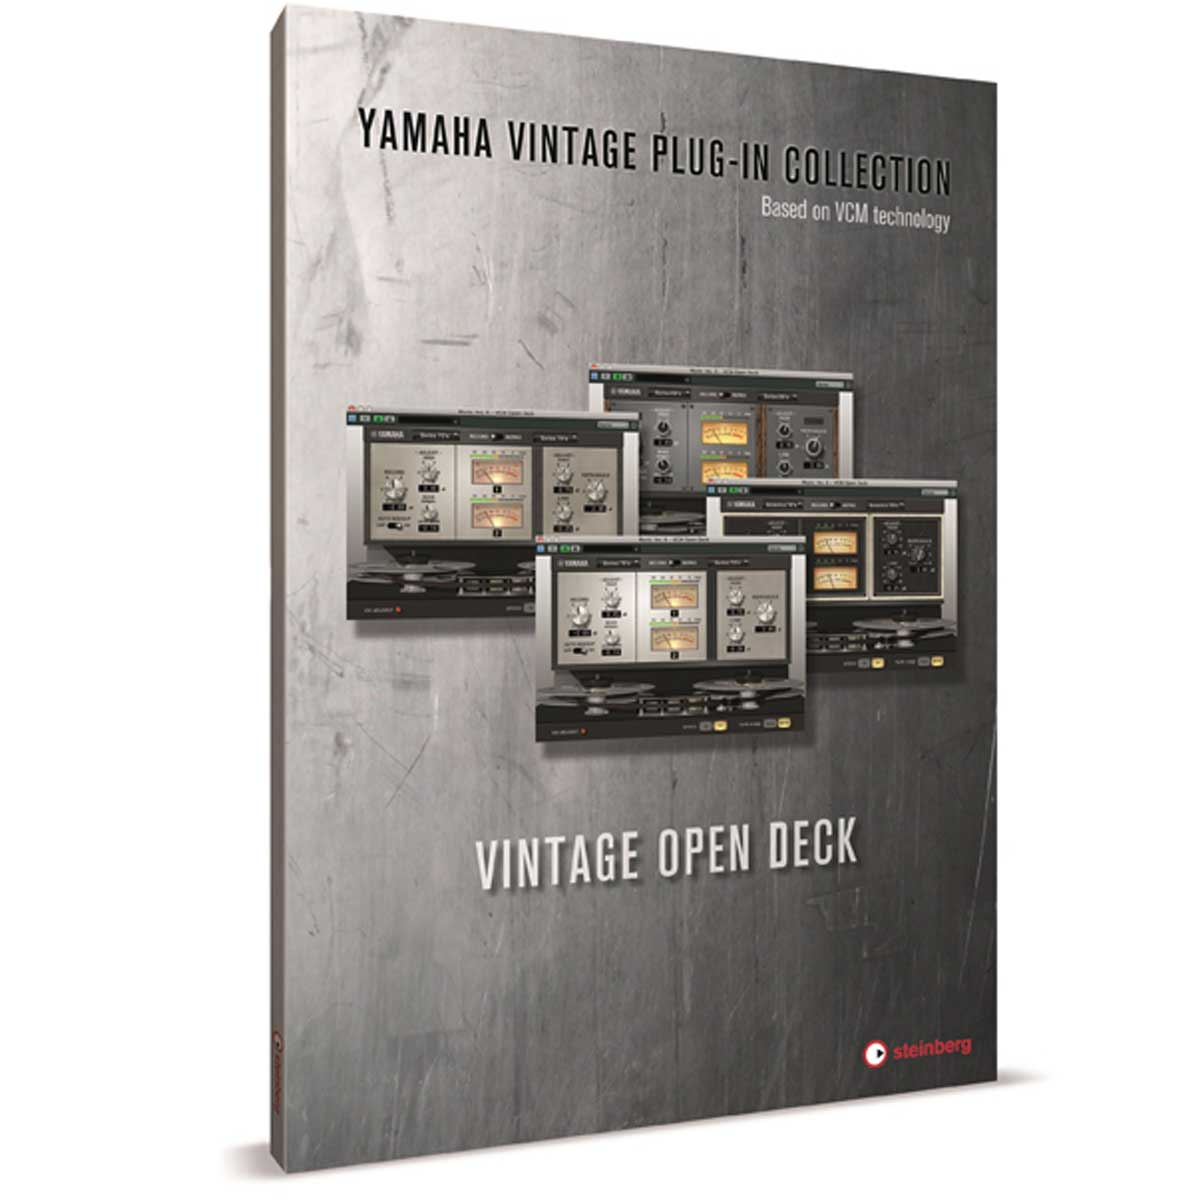 STEINBERG スタインバーグ / Vintage Open Deck テープサチュレータープラグイン【お取り寄せ商品】【WEBSHOP】